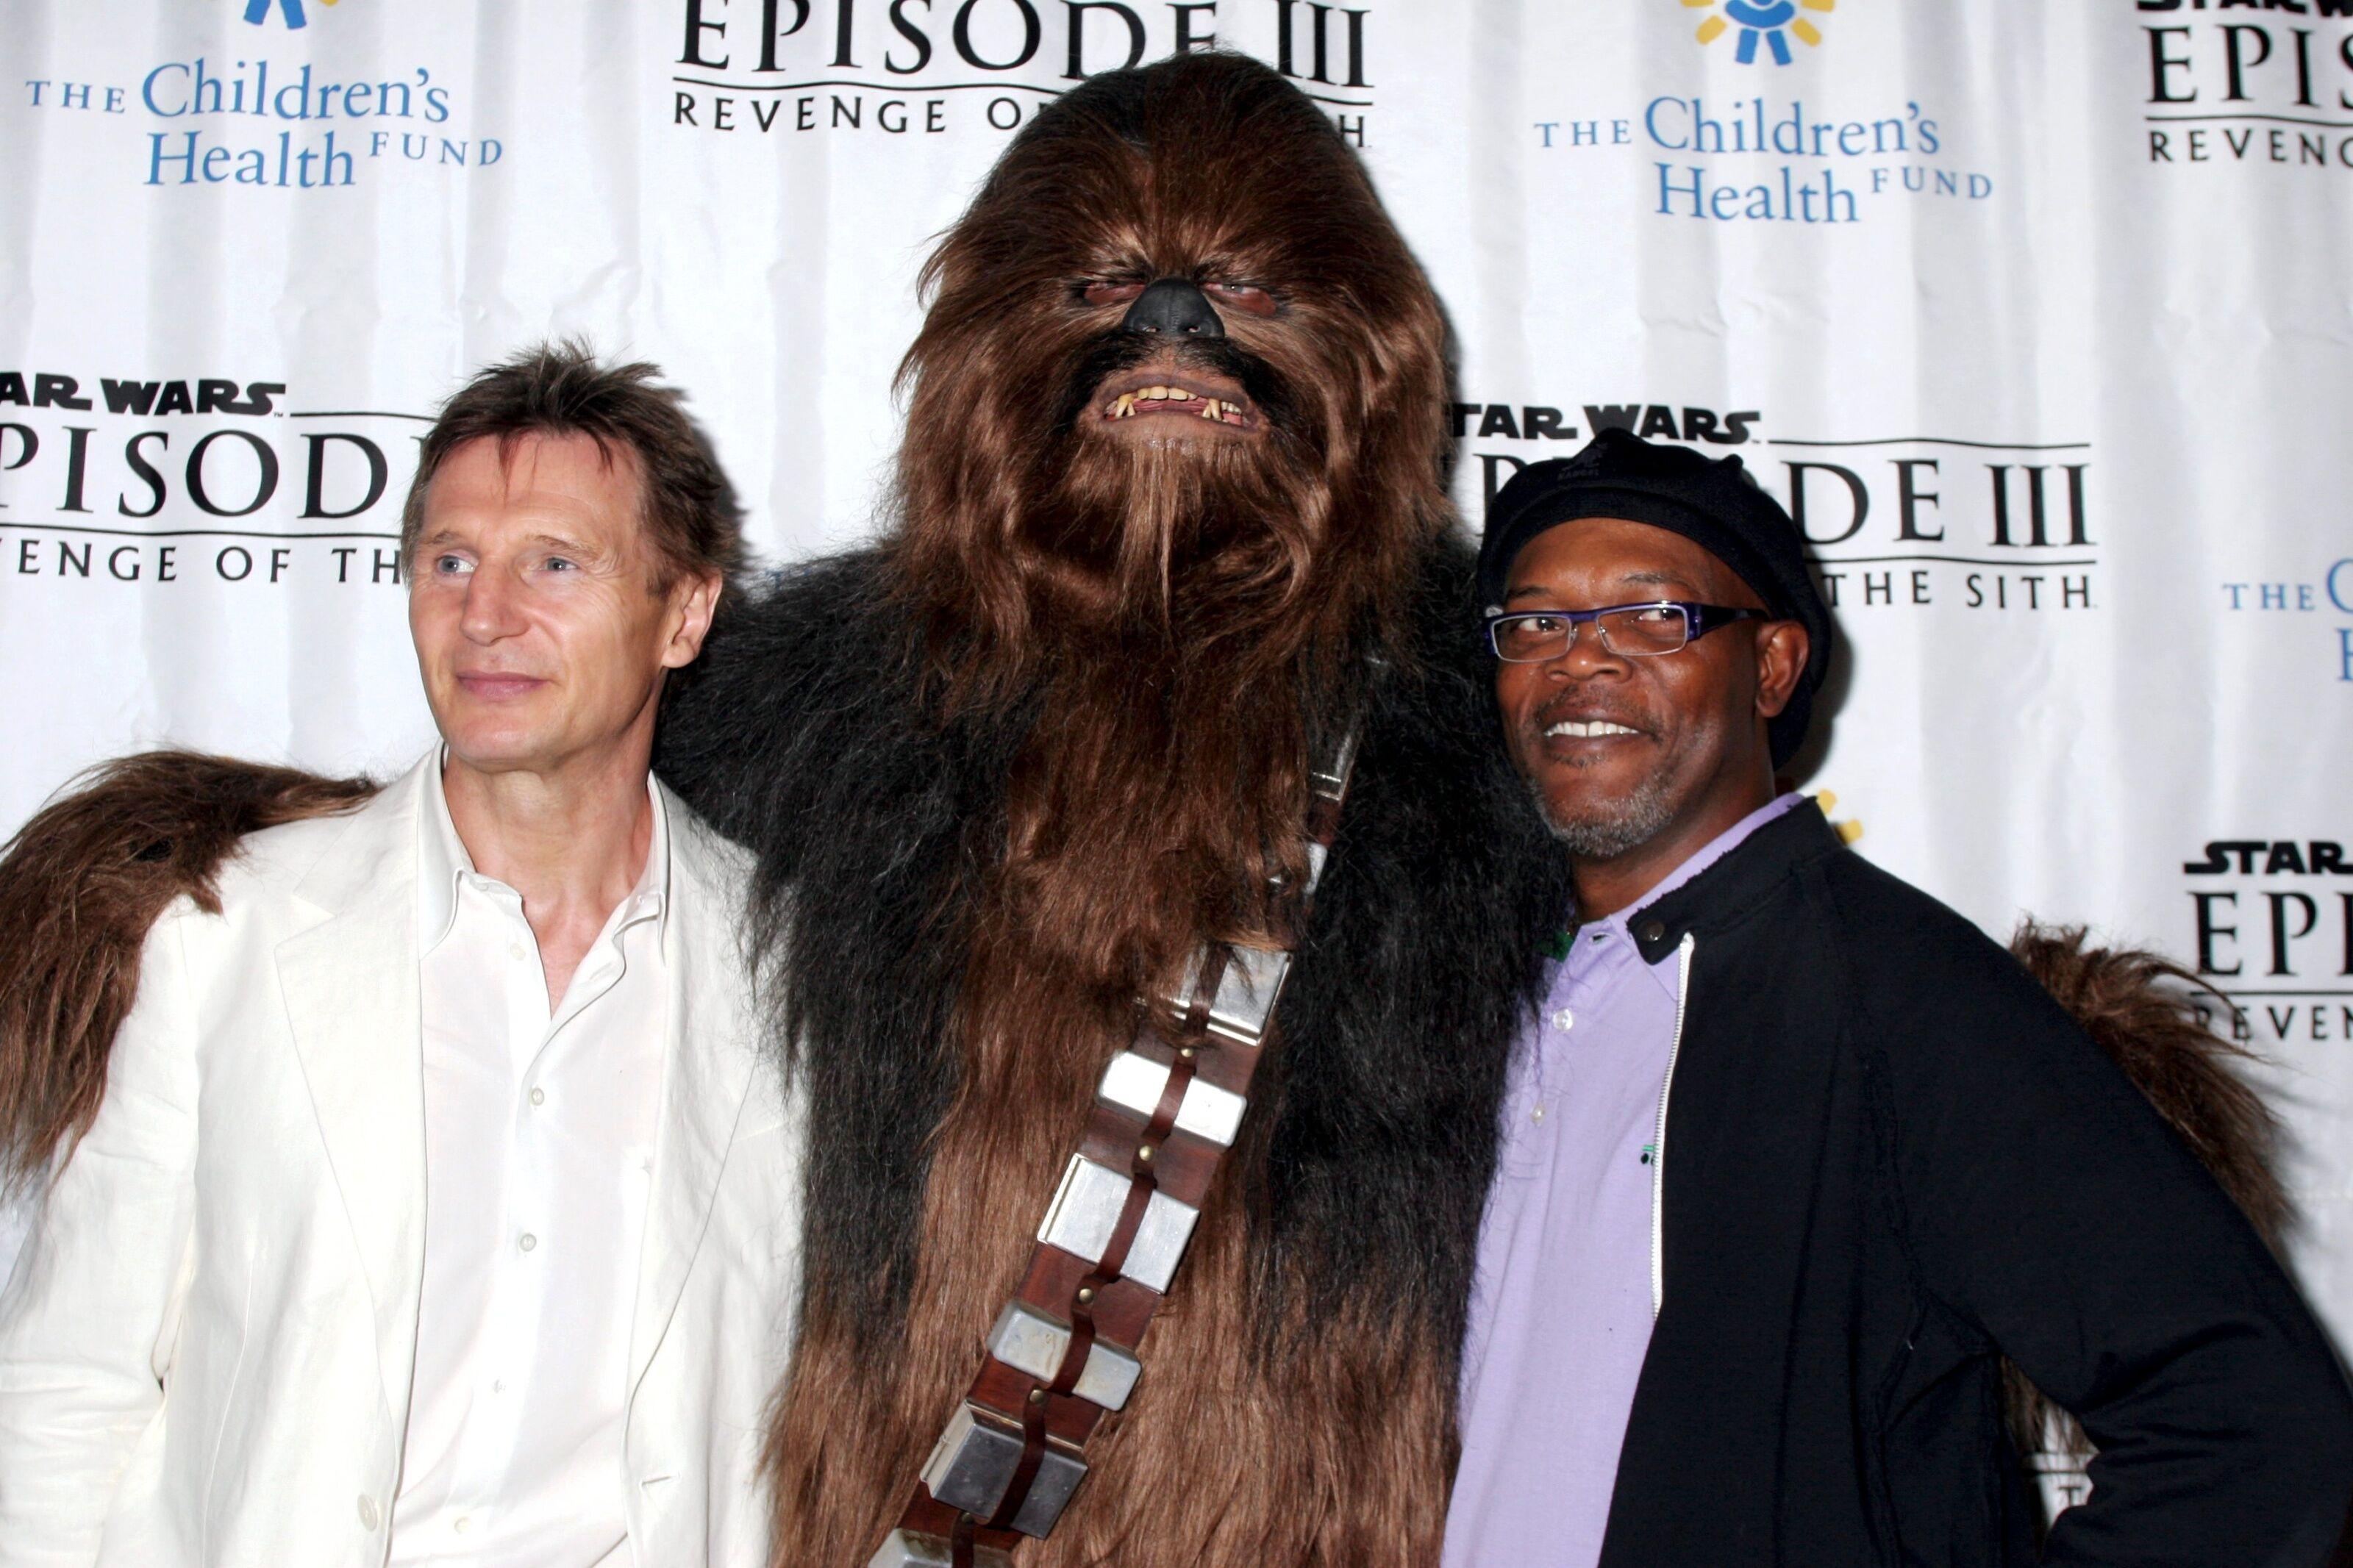 Samuel L. Jackson wants to bring Mace Windu back to Star Wars universe